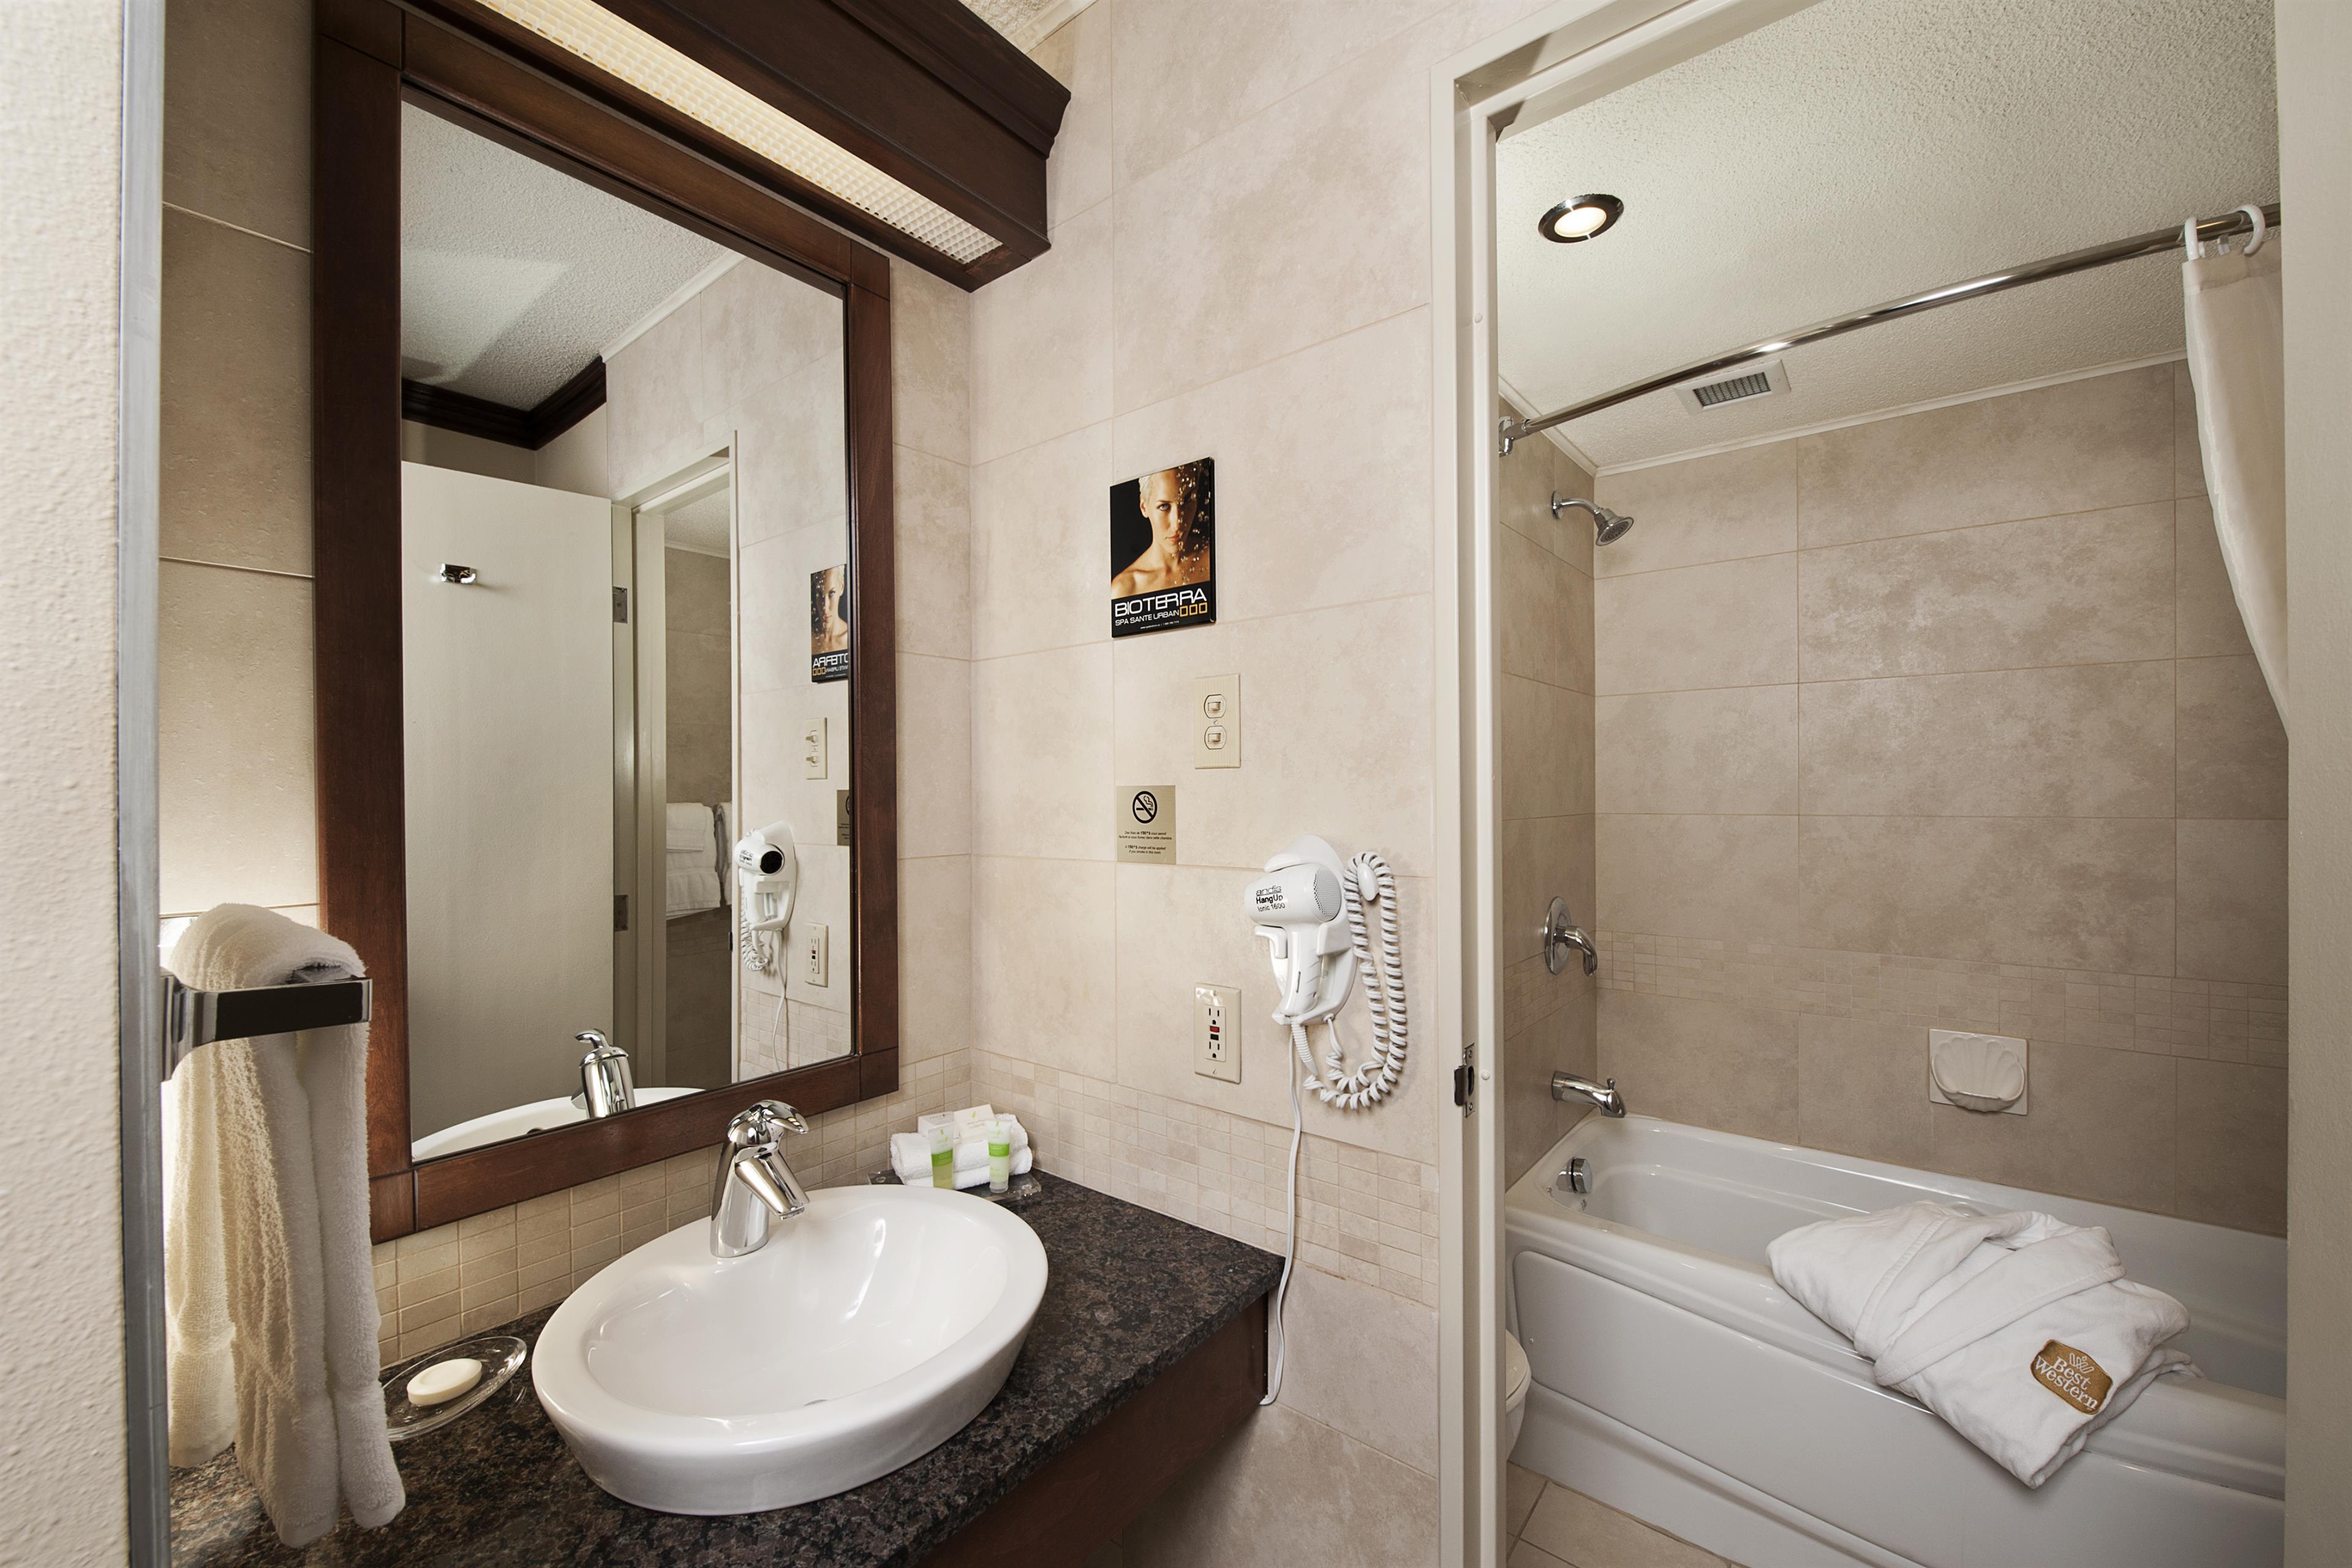 Best Western Hotel Universel Drummondville à Drummondville: Guest Room